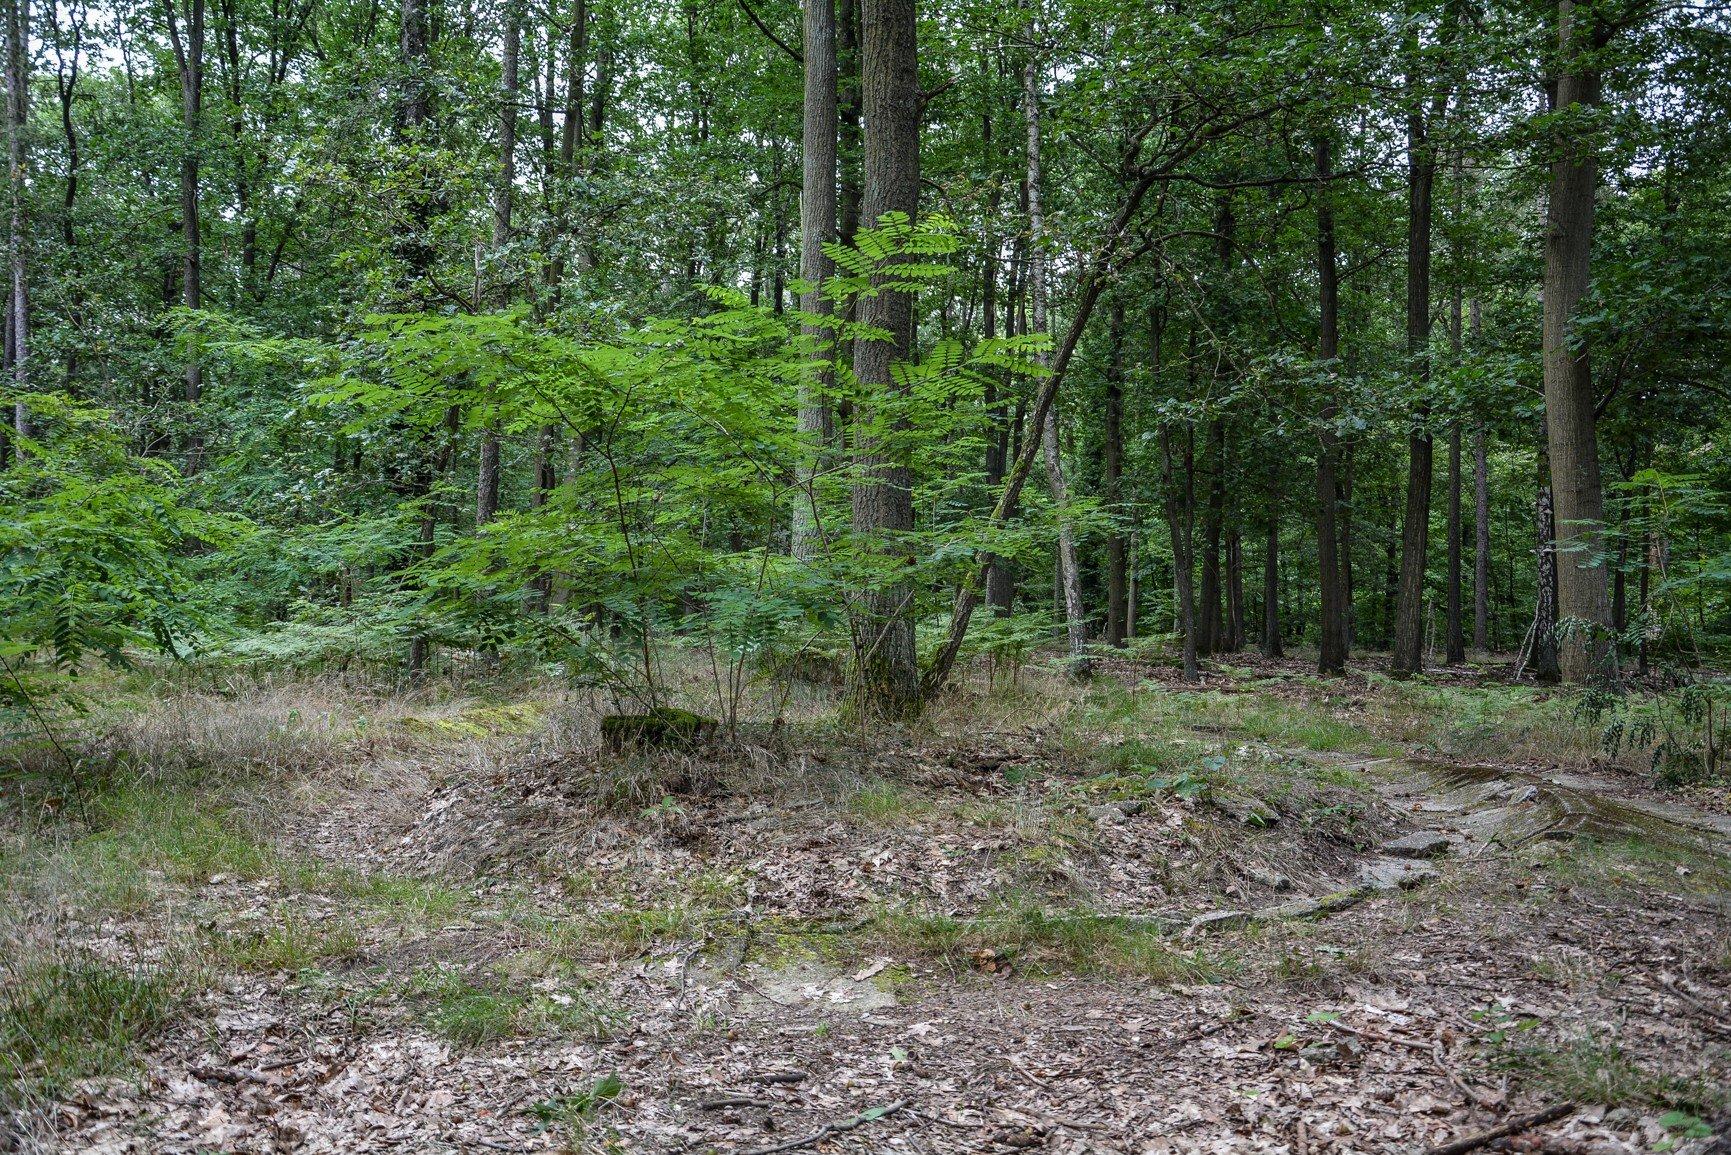 kurven ansicht avus südkurve modell berlin charlottenburg lost places urbex abandoned berlin